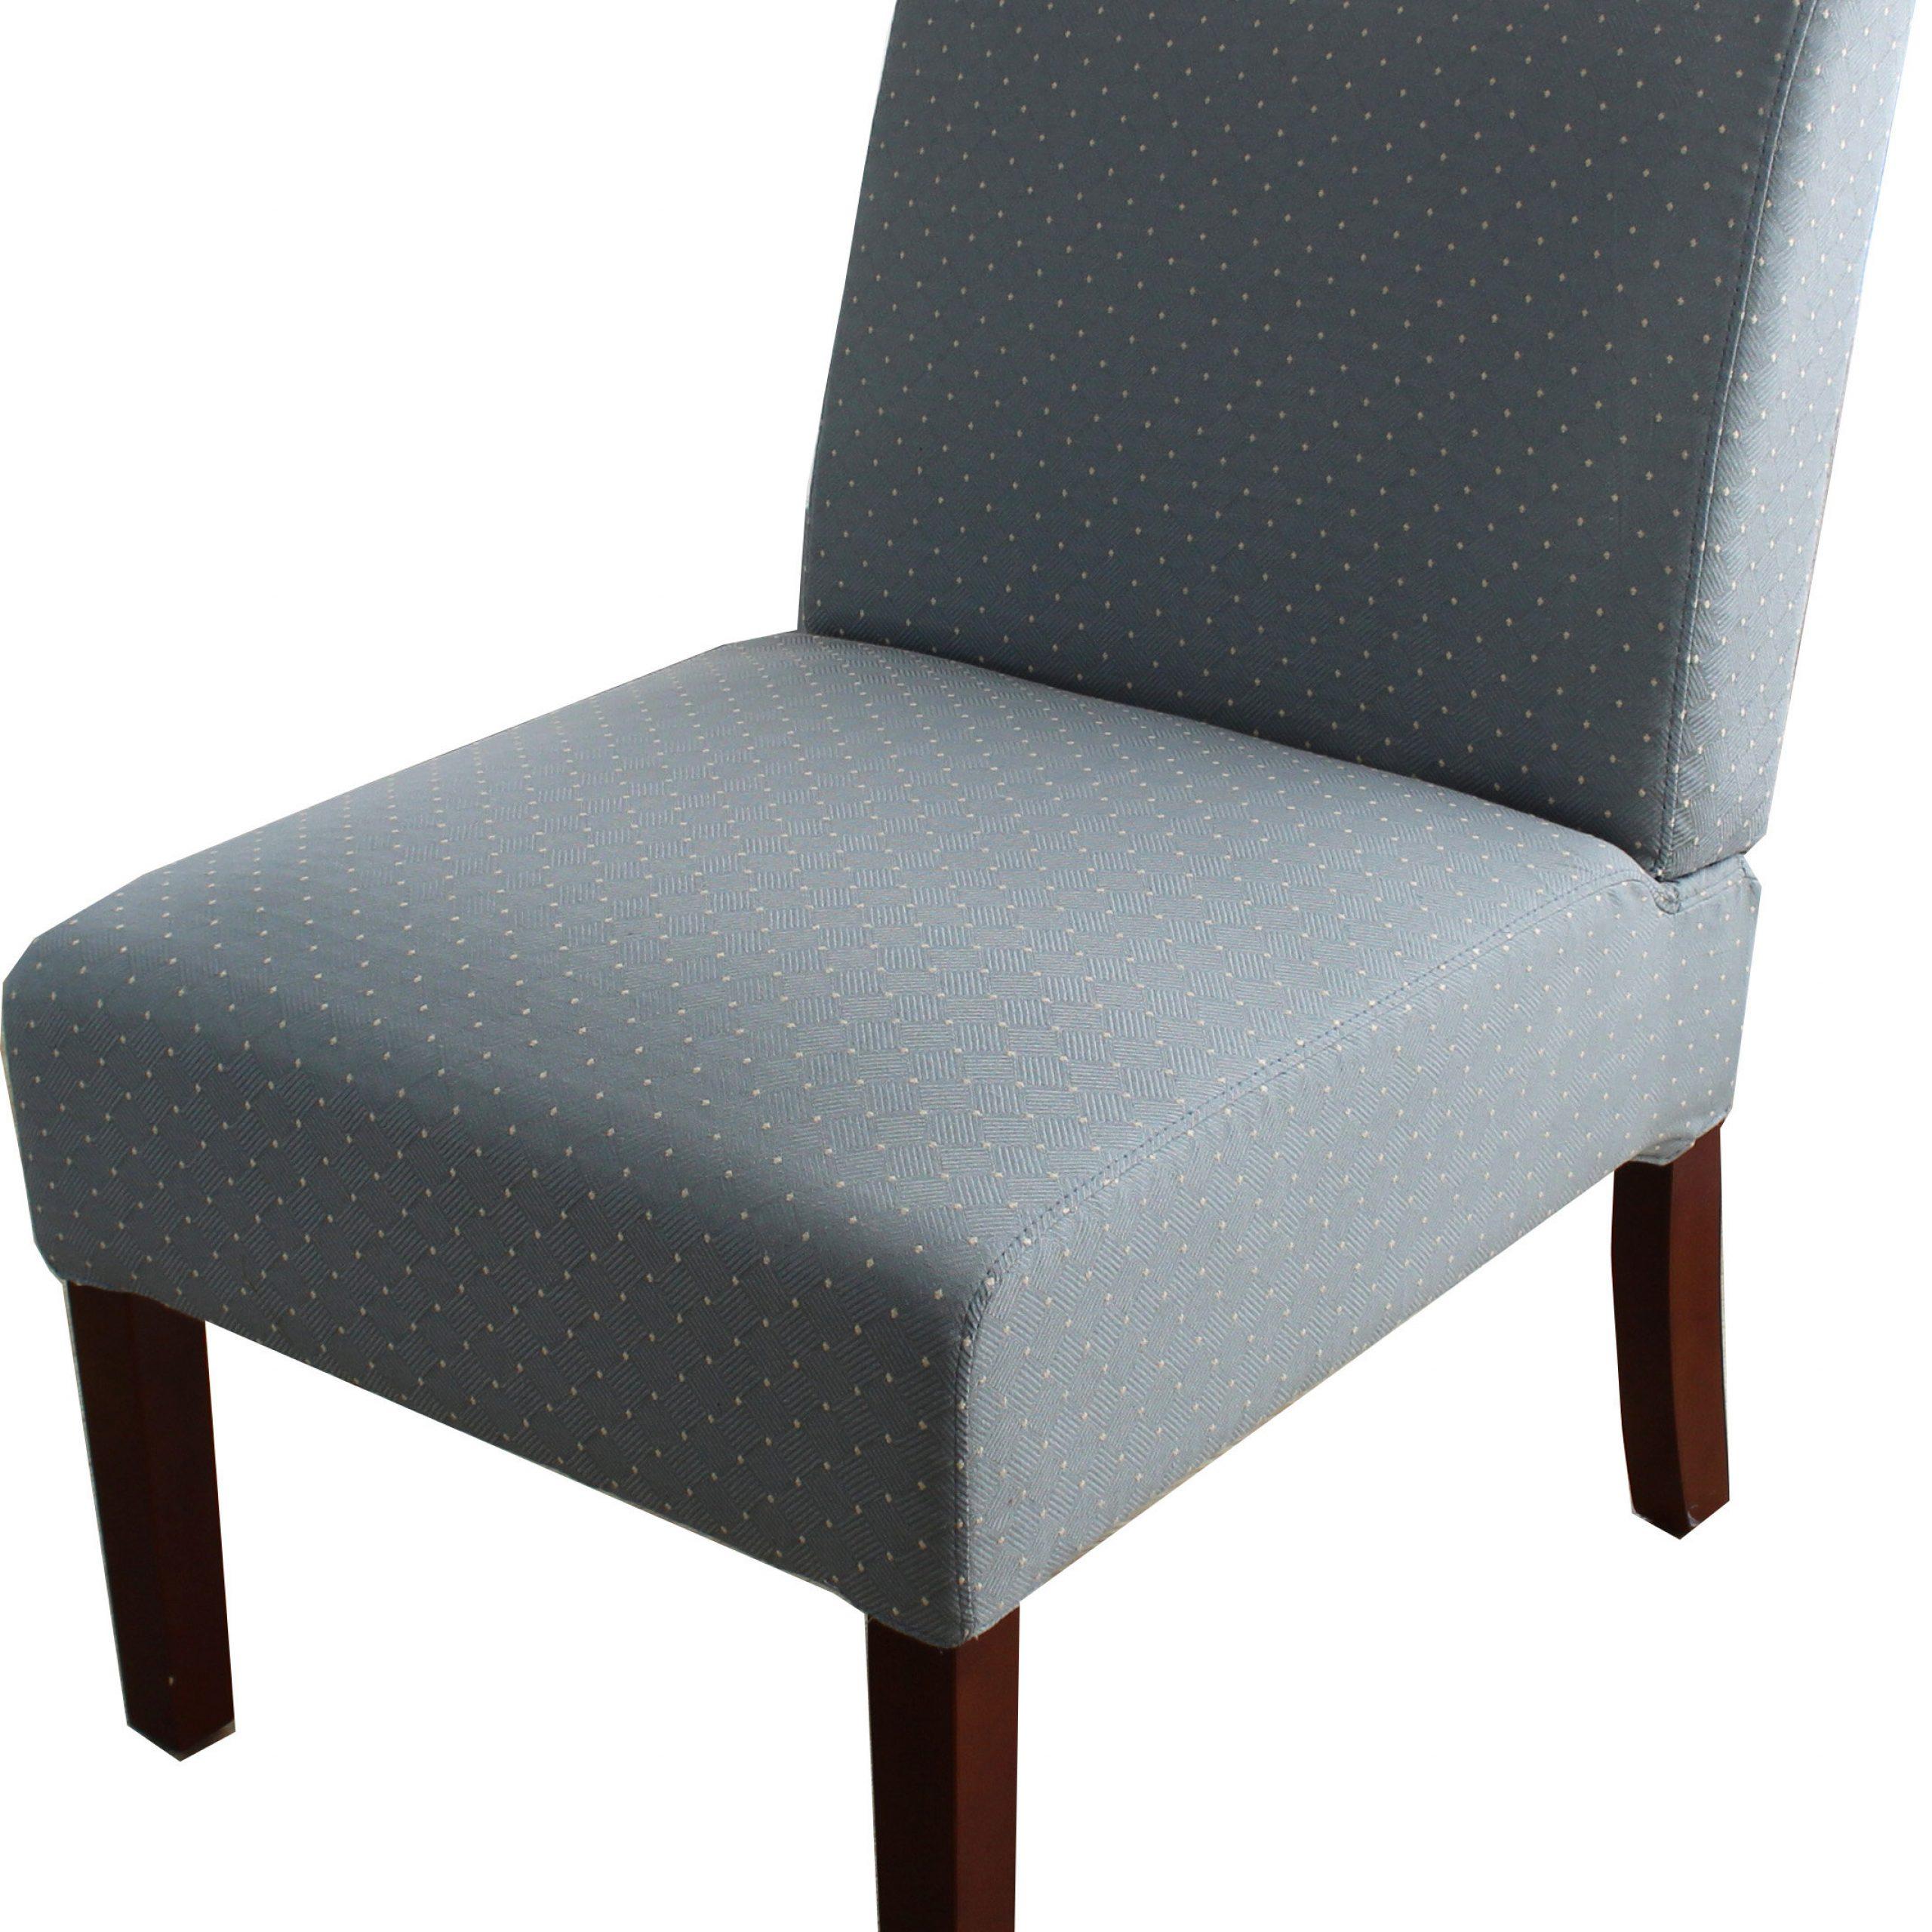 Aniruddha Slipper Chairs Pertaining To Current Wodehouse Slipper Chair (View 3 of 20)